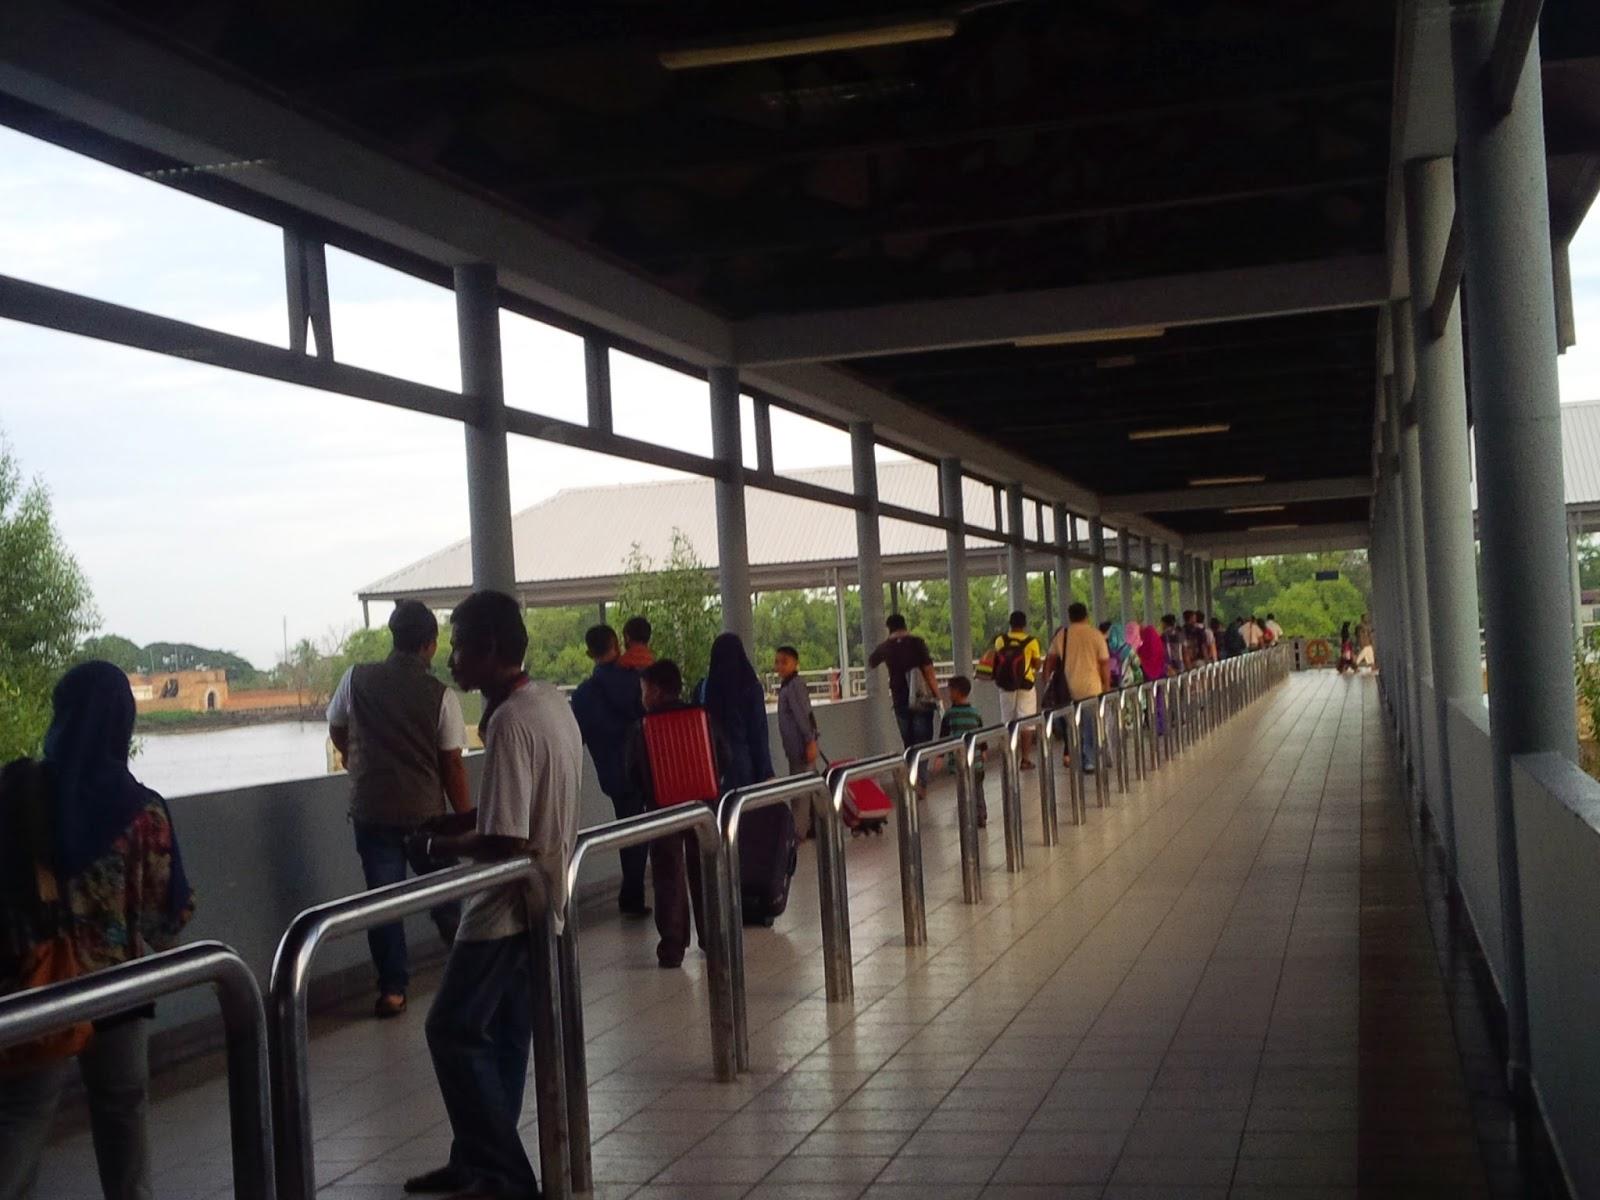 "boat langkawi, ferry kuala perlis, ferry langkawi, ferry ride, ferry terminal, ""malaysia travel influencer,  malaysia influencer,  blog with cris,  malaysia blogger,  malaysia freelance model,  jadual feri kuala kedah ke langkawi 2019,  jadual feri kuala kedah ke langkawi 2018,  kuala perlis jetty,  jadual feri kuala perlis ke langkawi 2019,  jadual feri langkawi 2019,  jadual feri langkawi kuala kedah 2019,  harga tiket feri langkawi 2019,  feri langkawi bawa kereta,  jadual feri langkawi 2019,  ferry to langkawi with car,  kuala kedah jetty parking,  penang to kuala kedah,  feri langkawi bawa kereta,  parking kereta di jeti kuala perlis,  kuala kedah roro,  kuala kedah jetty to koh lipe,  waktu operasi feri langkawi,  langkawi ferry 888,  penang to langkawi ferry review,  ferry penang to langkawi,  kuala lumpur to kuala perlis jetty,  hbr group bus,  kl to kuala kedah bus,  langkawi jetty address,  feri ke medan,  kaunter tiket bas kuala perlis,  harga sebuah feri,  langkawi cargo ferry,  ferry port klang to langkawi,  langkawi ferry to airport,  langkawi to penang distance,  penang to langkawi map, kuala kedah ferry terminal, tourism, travel"